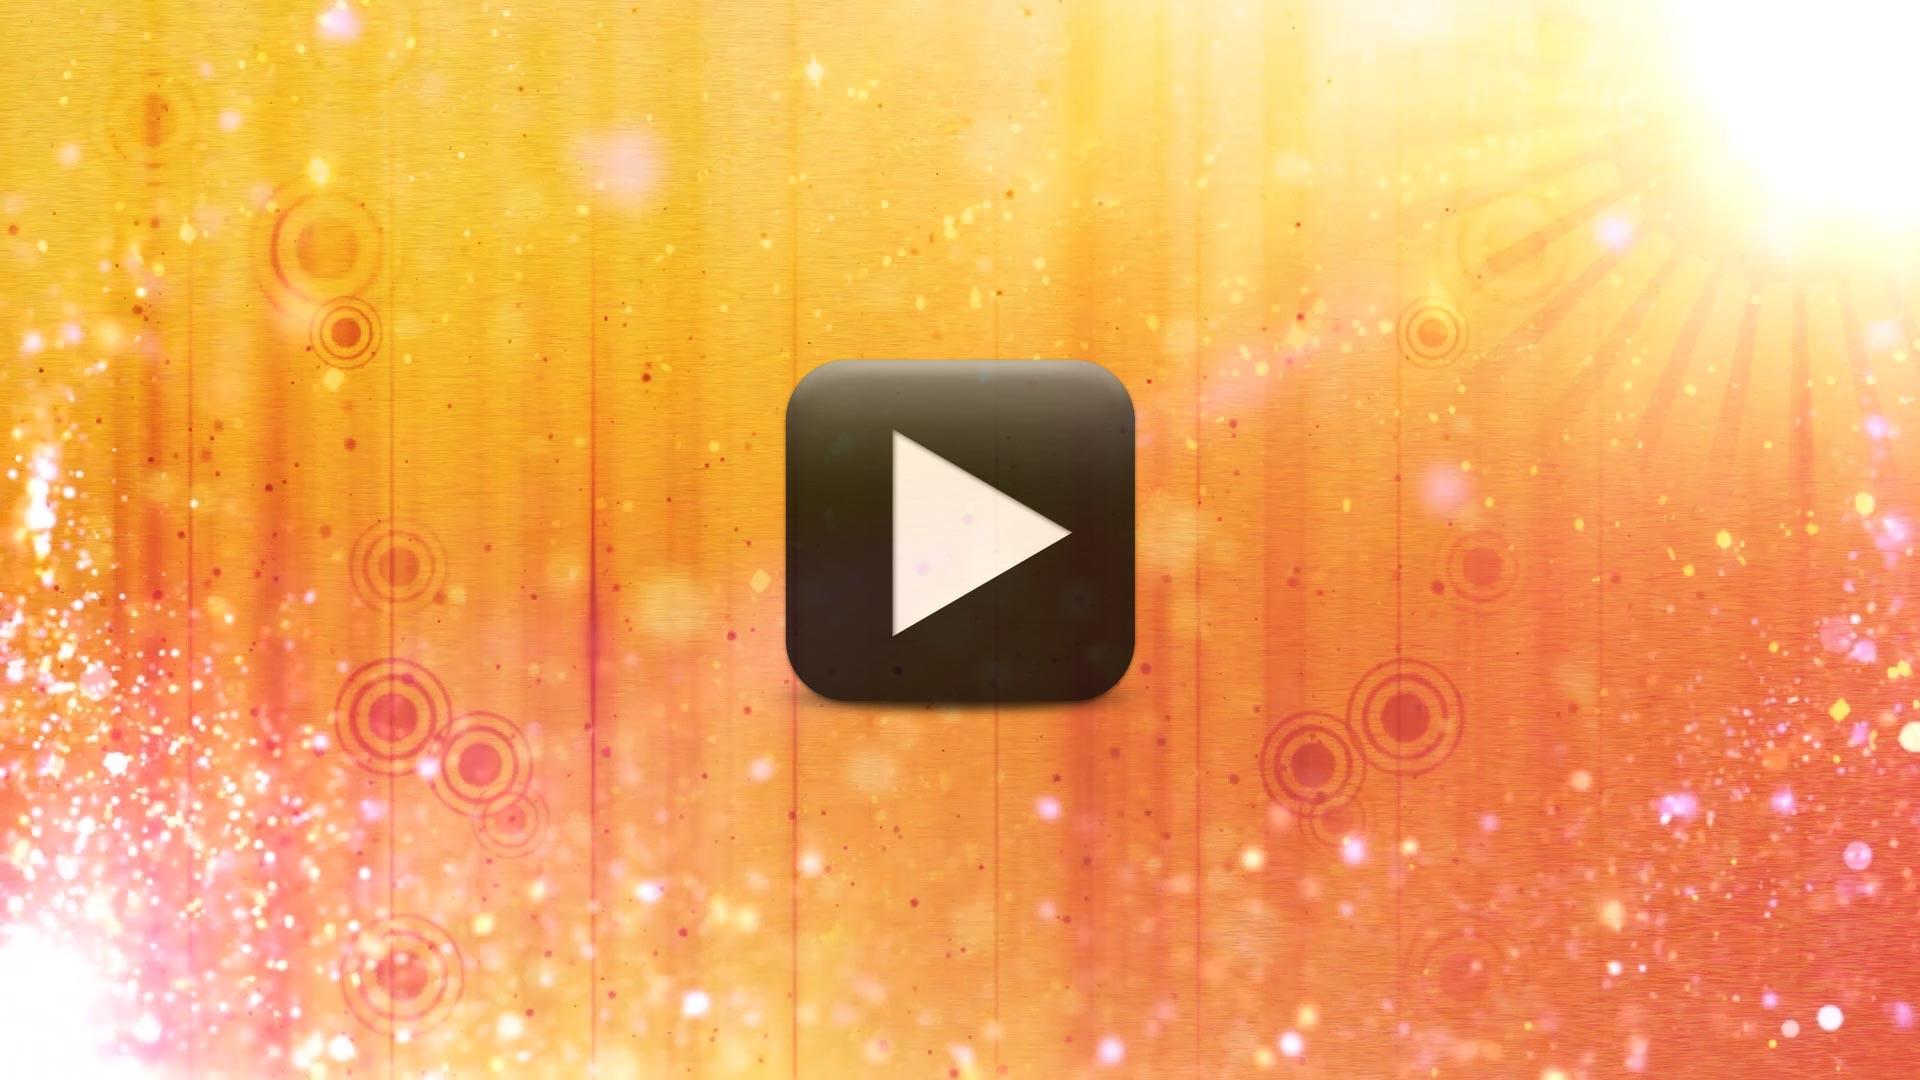 Wedding Intro Video Effects -Warm Sun Motion Background